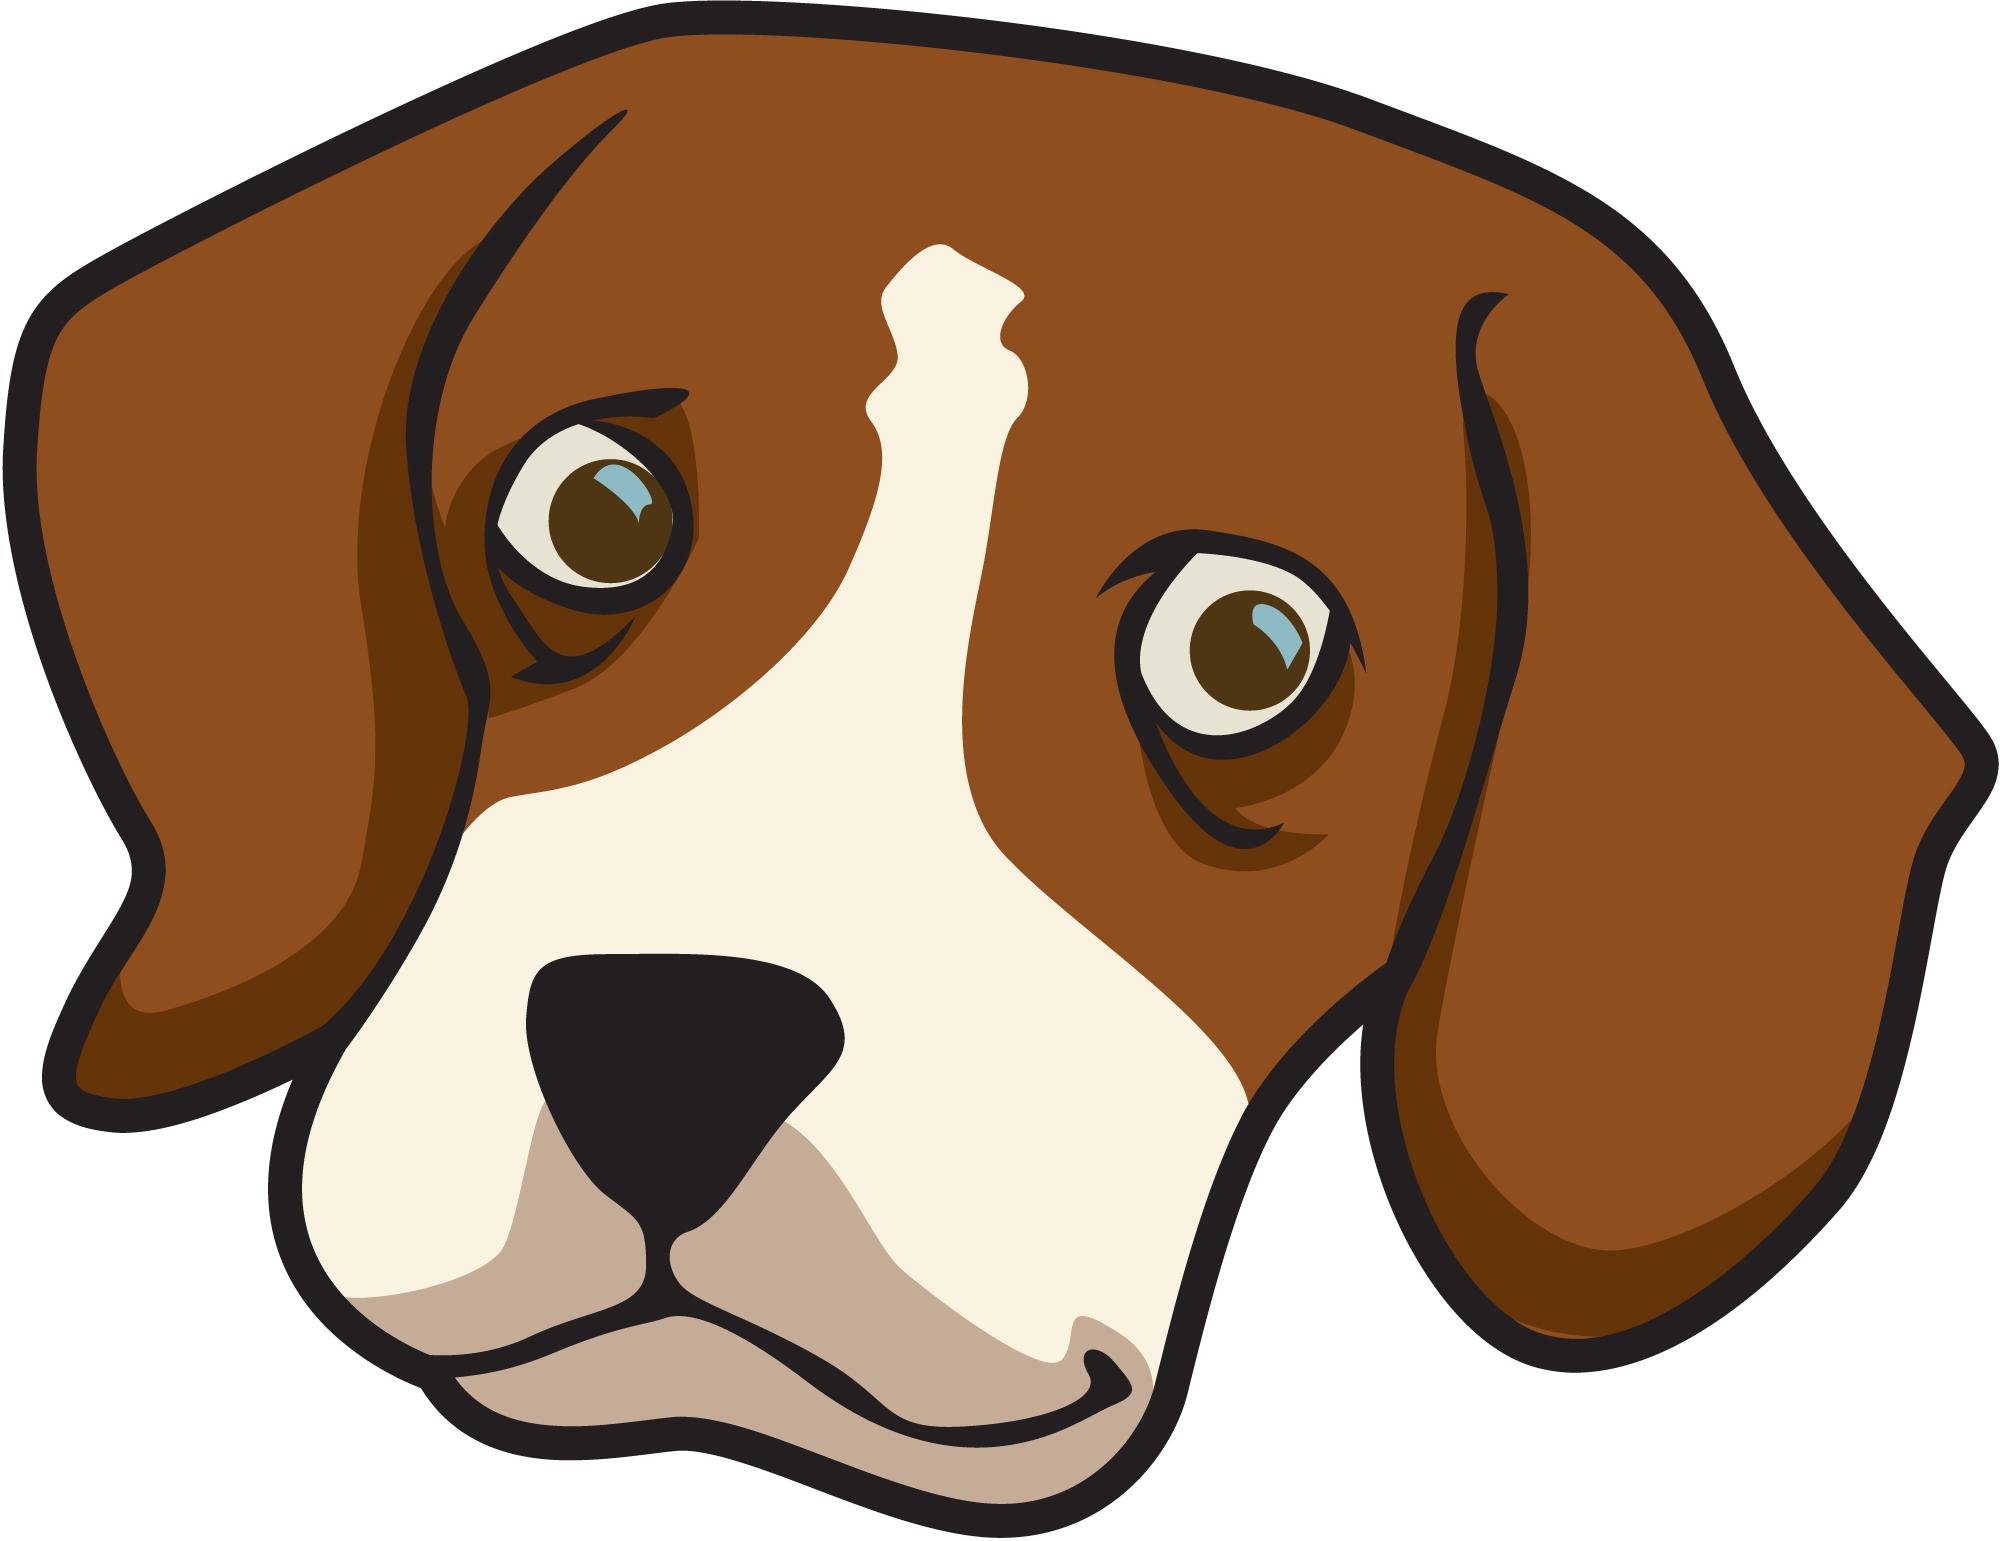 dog face clipart rh clipart info sad dog face clipart dog face mask clipart